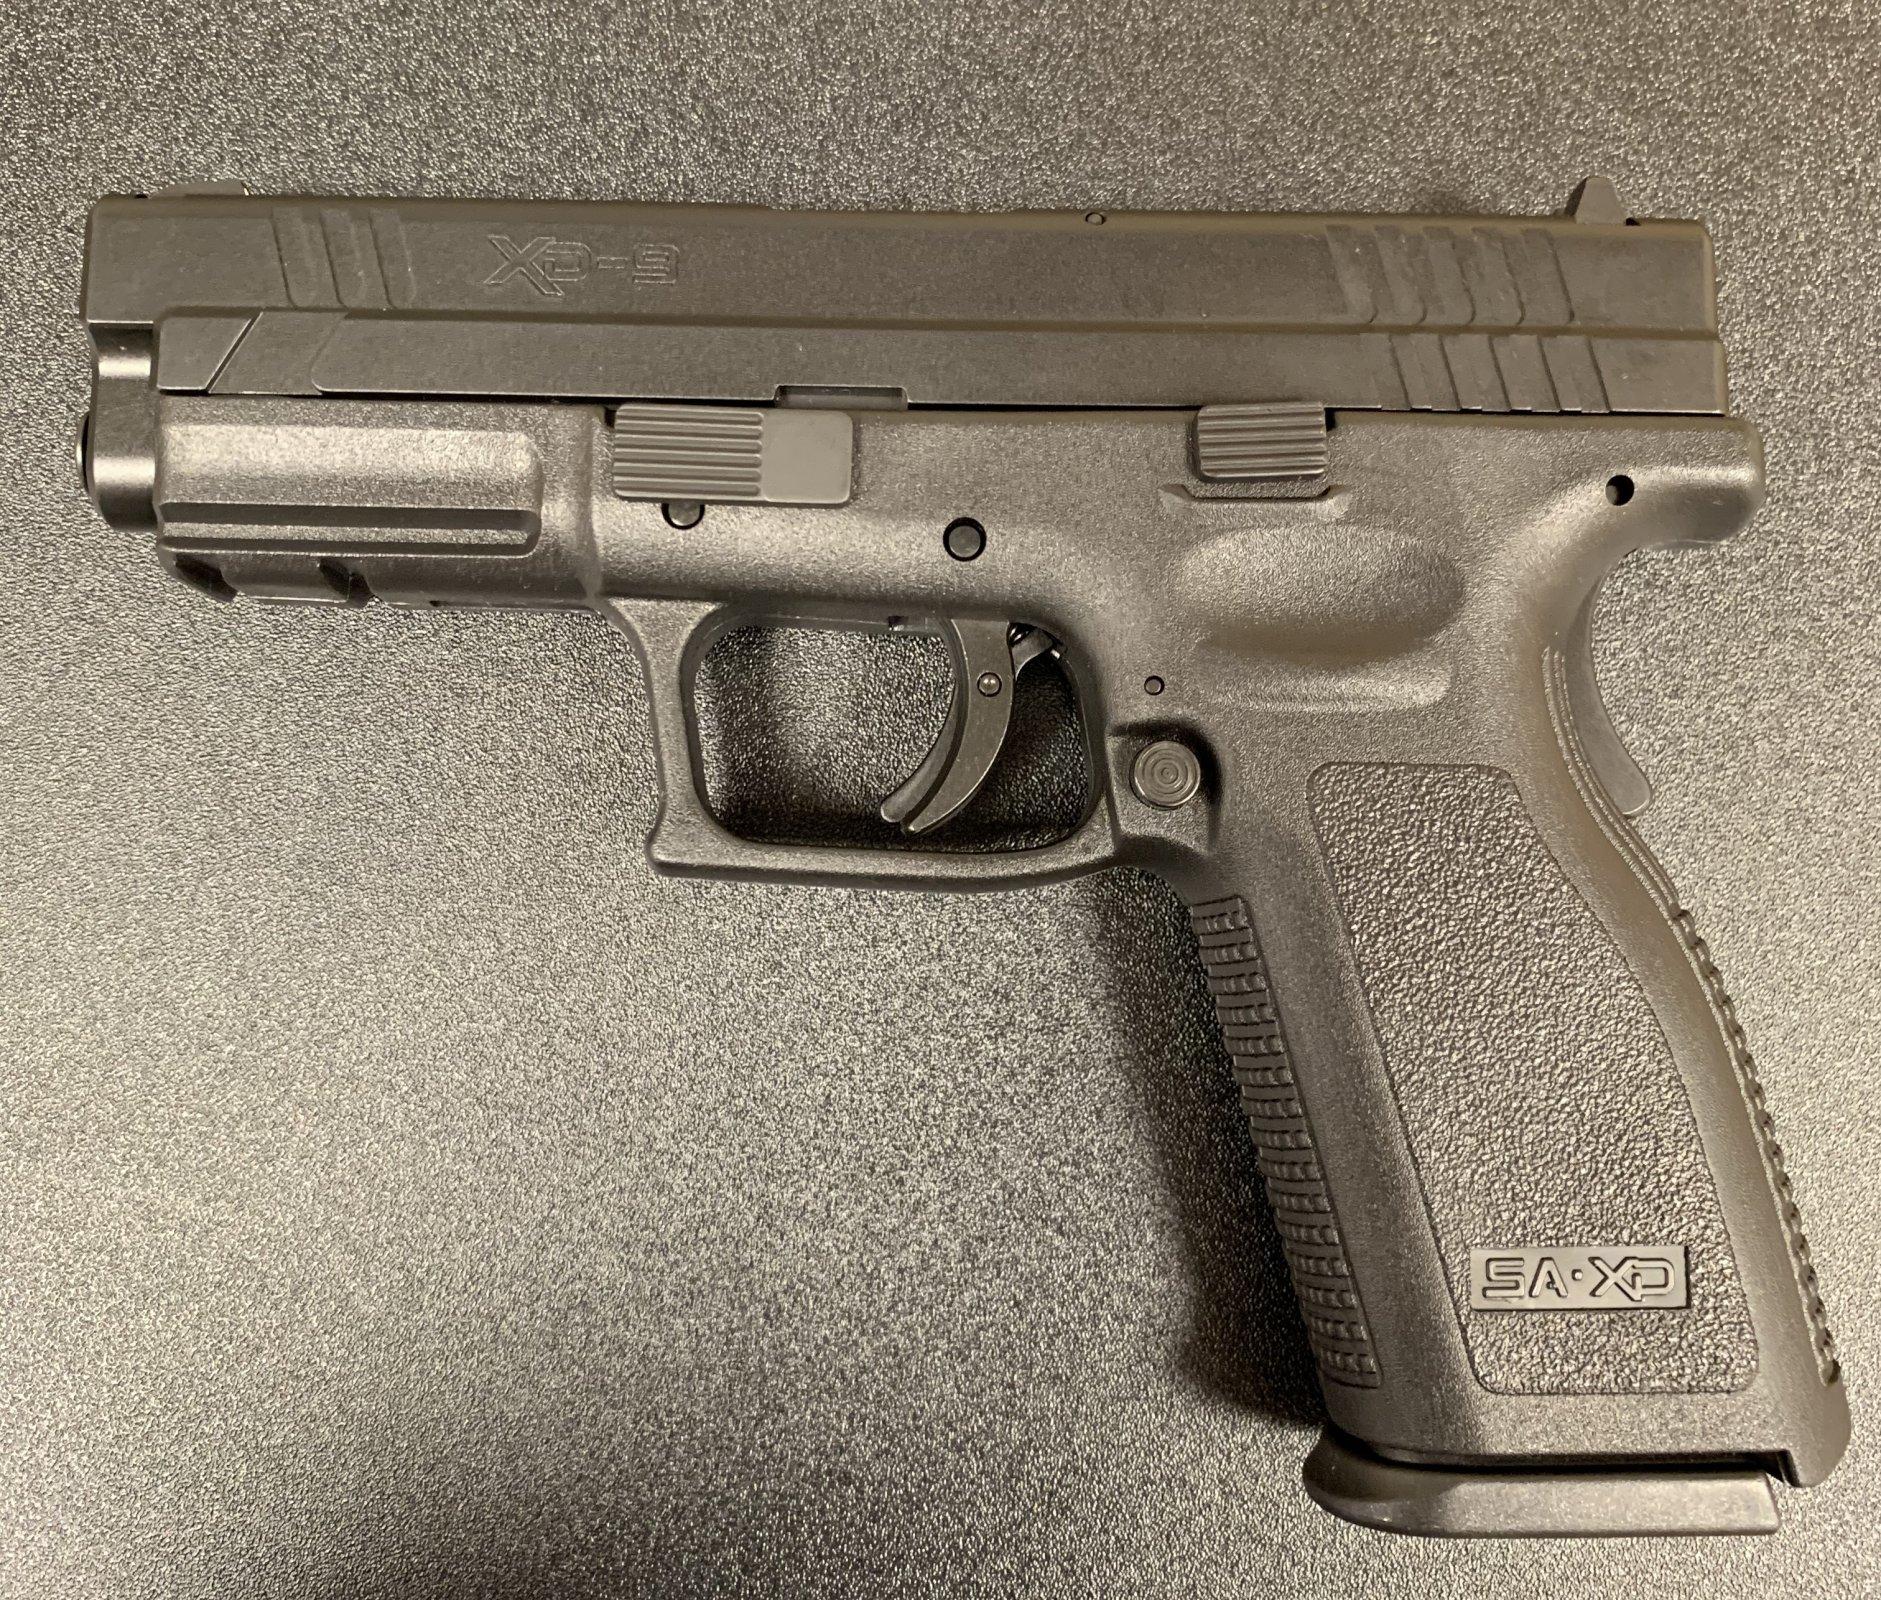 Springfield Armory XD9 9mm Pistol 4in Barrel - Black